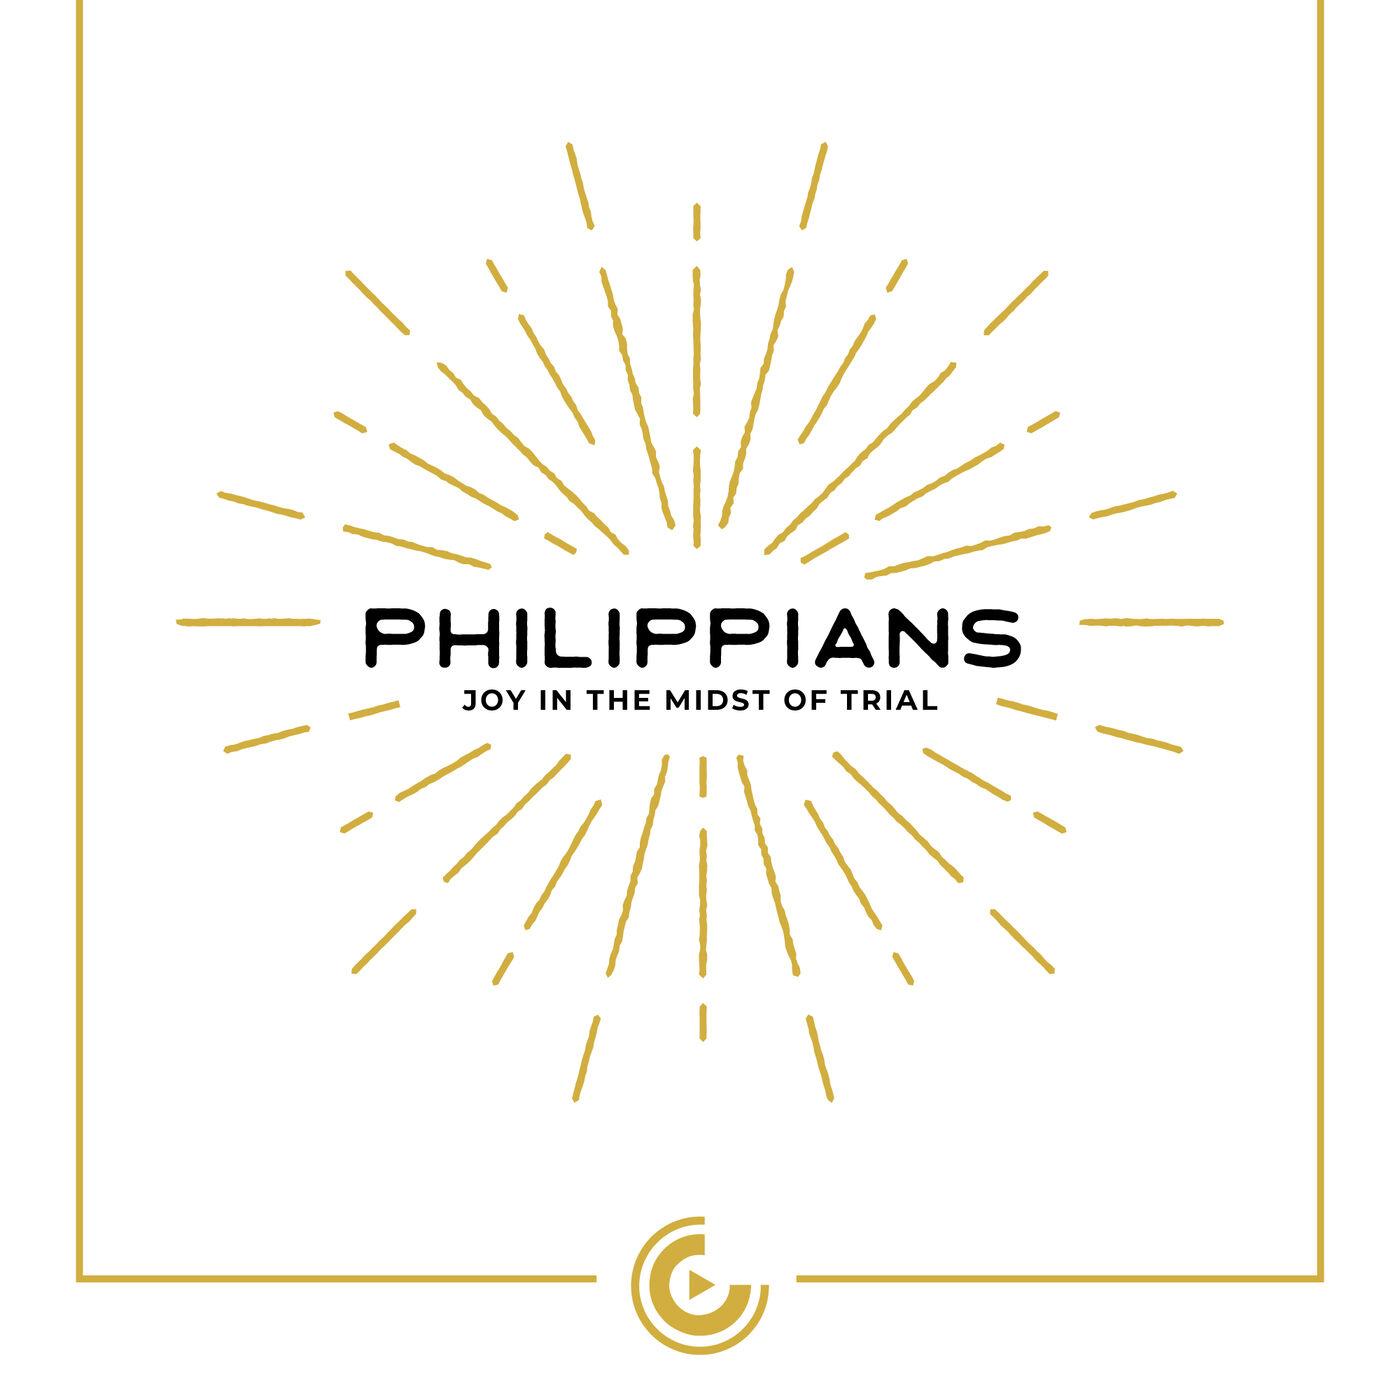 Christ Church Media Bible Study: Philippians 1:6-8